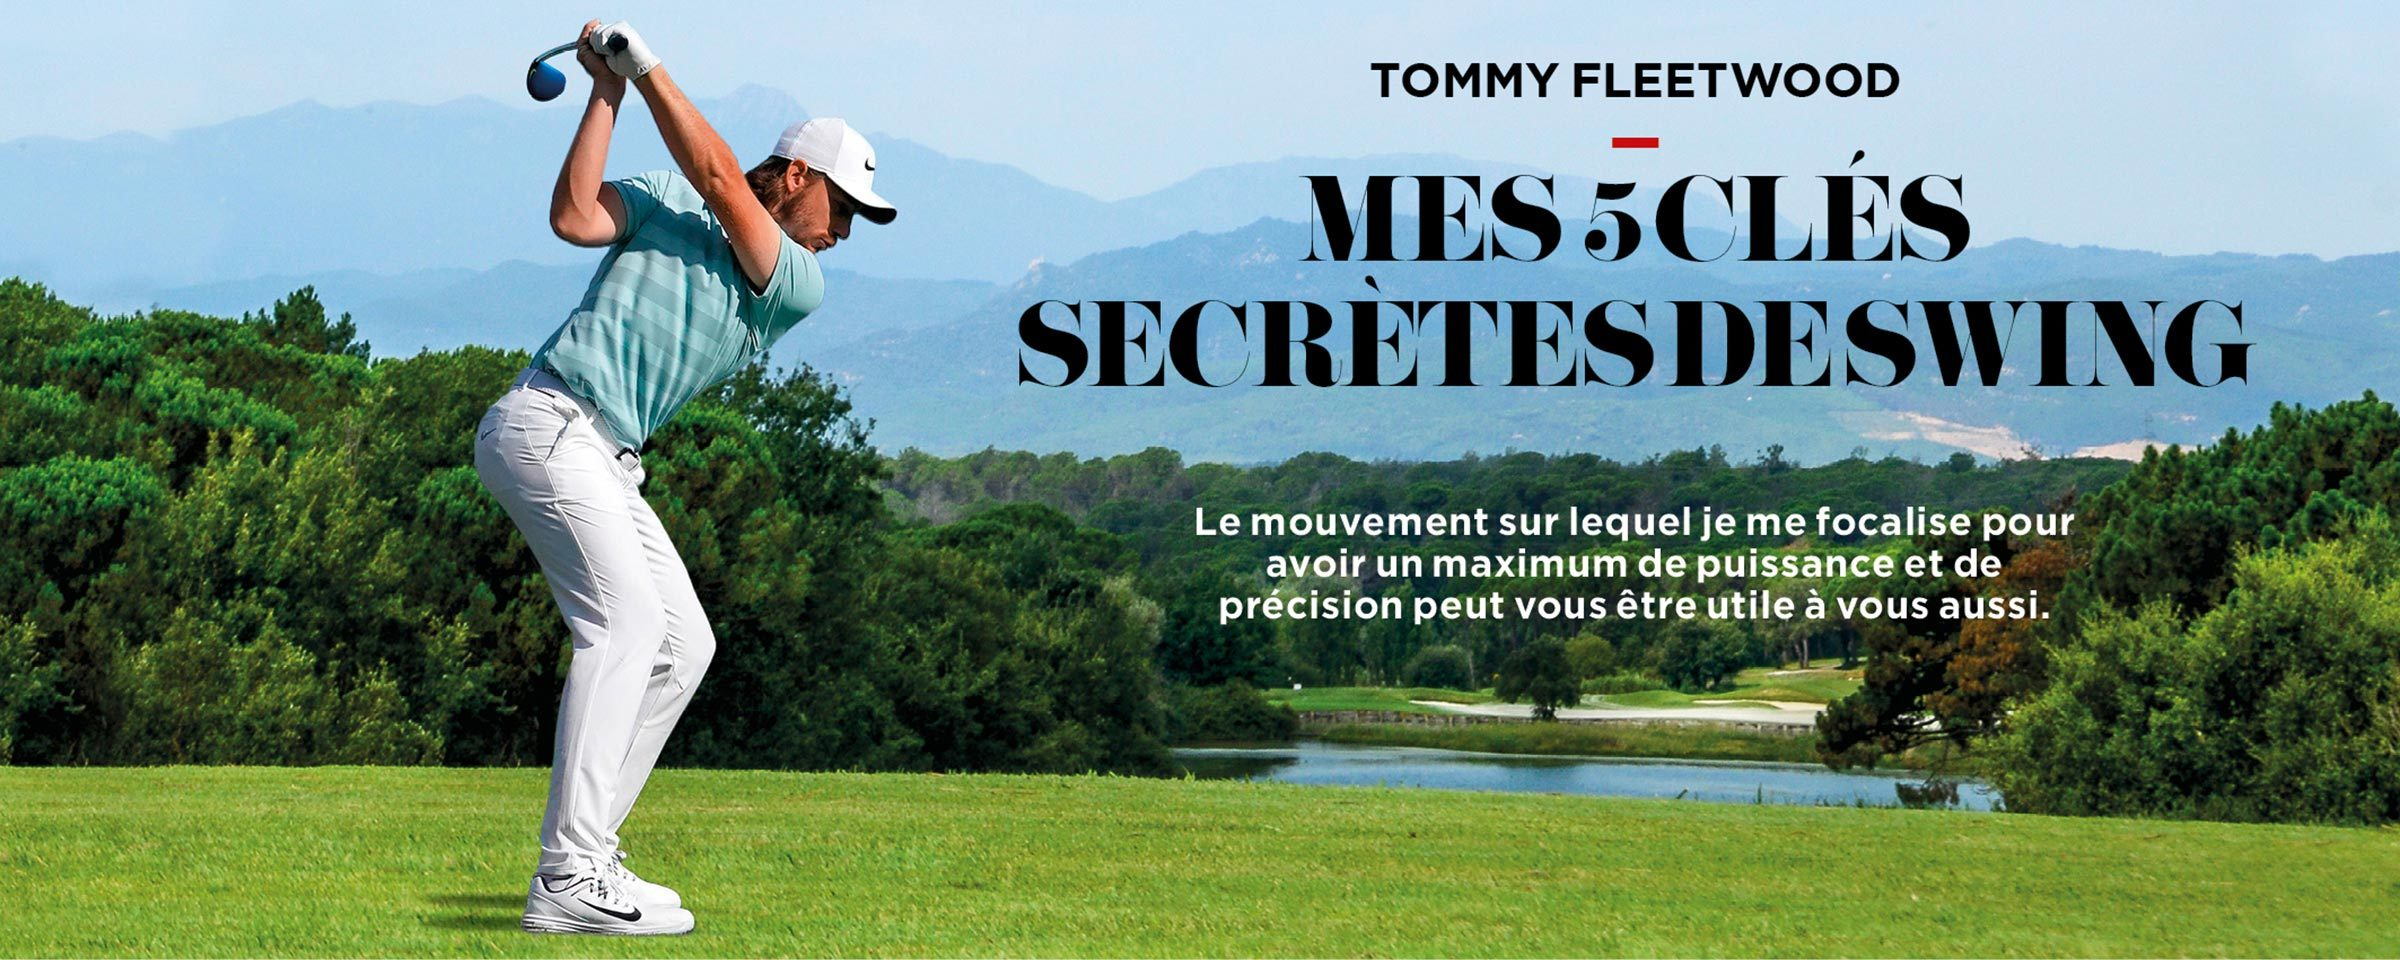 Tommy Fleetwood